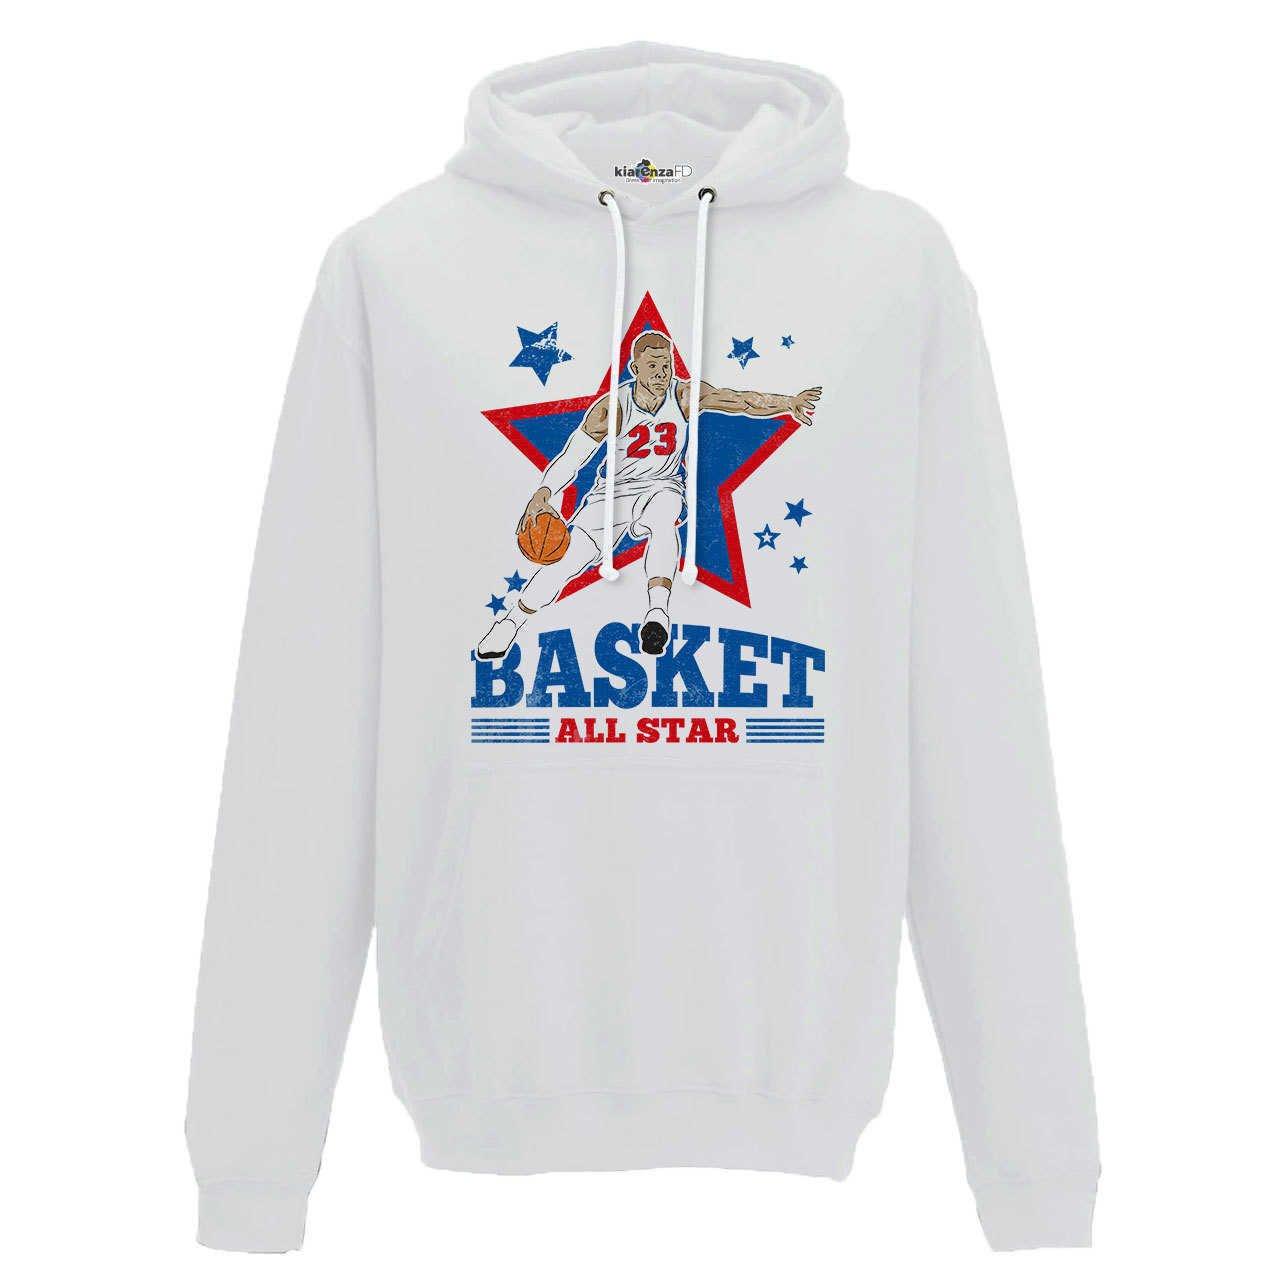 KiarenzaFD Sudadera Capucha Baloncesto Vintage Parodia Blake All ...